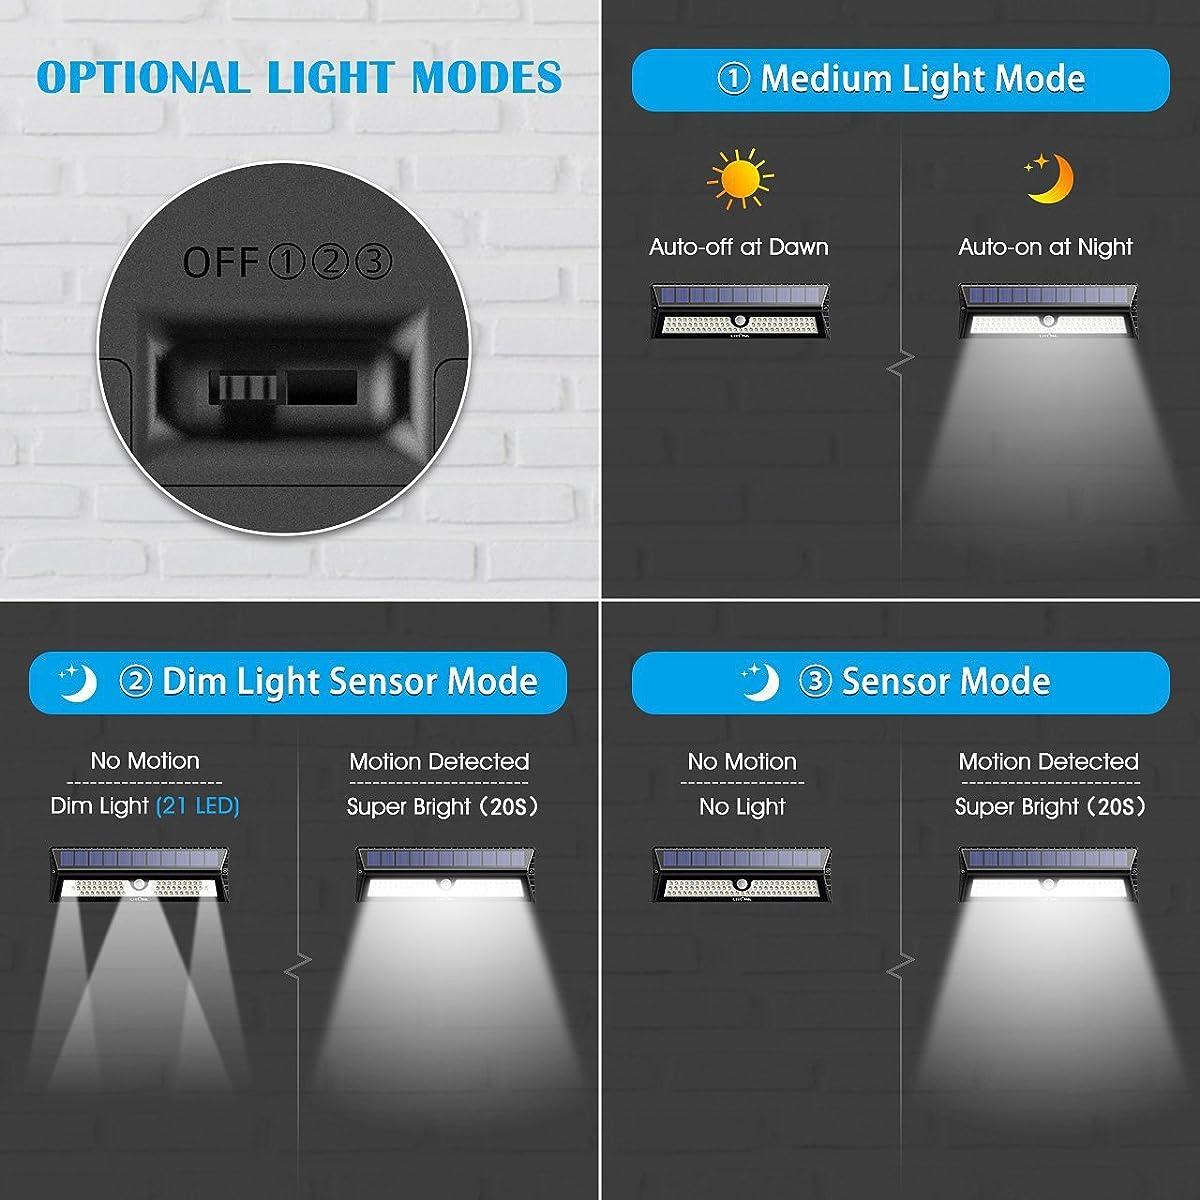 Litom 77 LEDs Solar Light, Super Bright Outdoor Solar Wall Lights with Motion Sensor & Great Waterproof, Security Wireless Nightlight for Garden Patio Path Back Yard